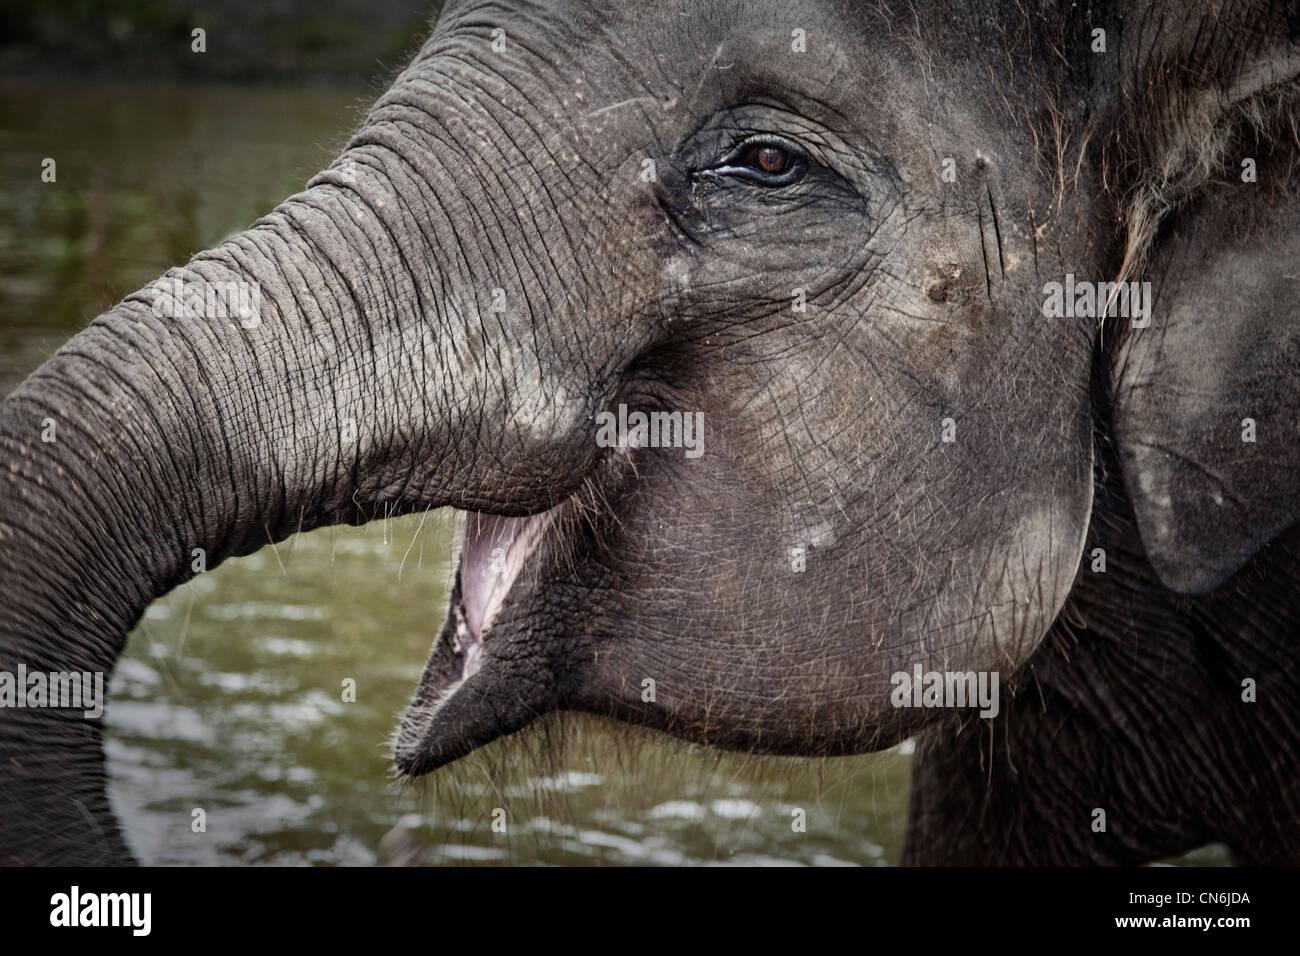 Close up of elephant head. Bali Indonesia. - Stock Image